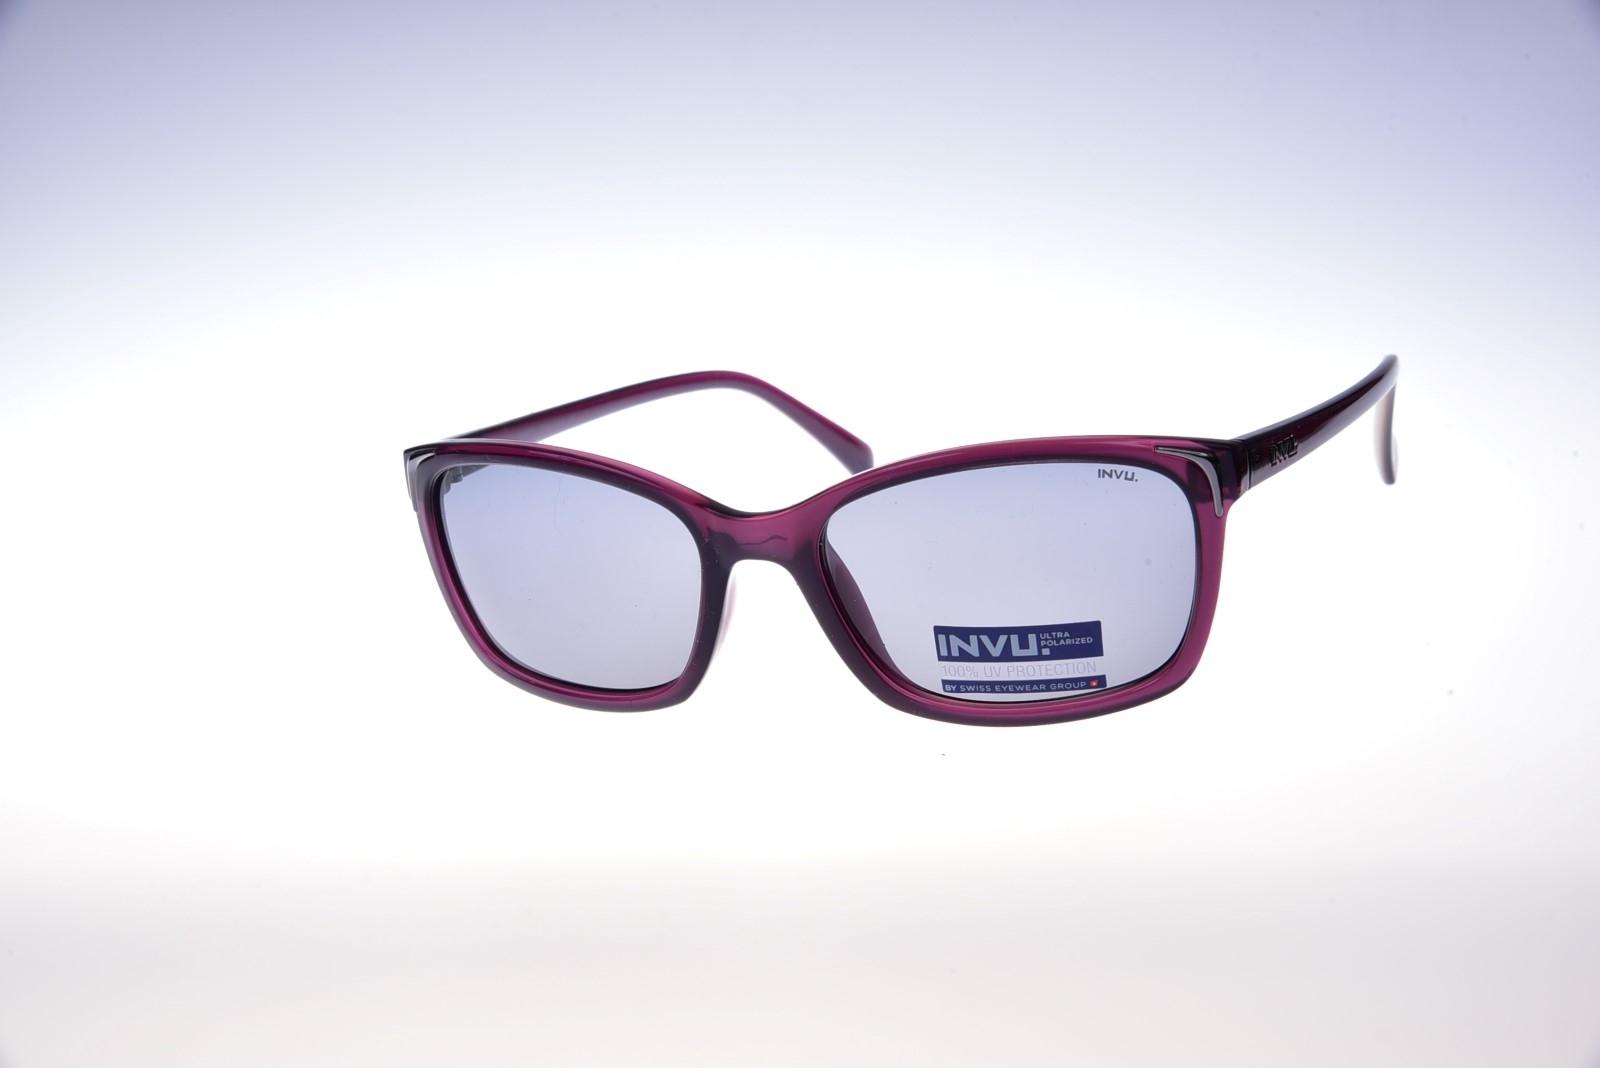 INVU. Classic B2404D - Dámske slnečné okuliare